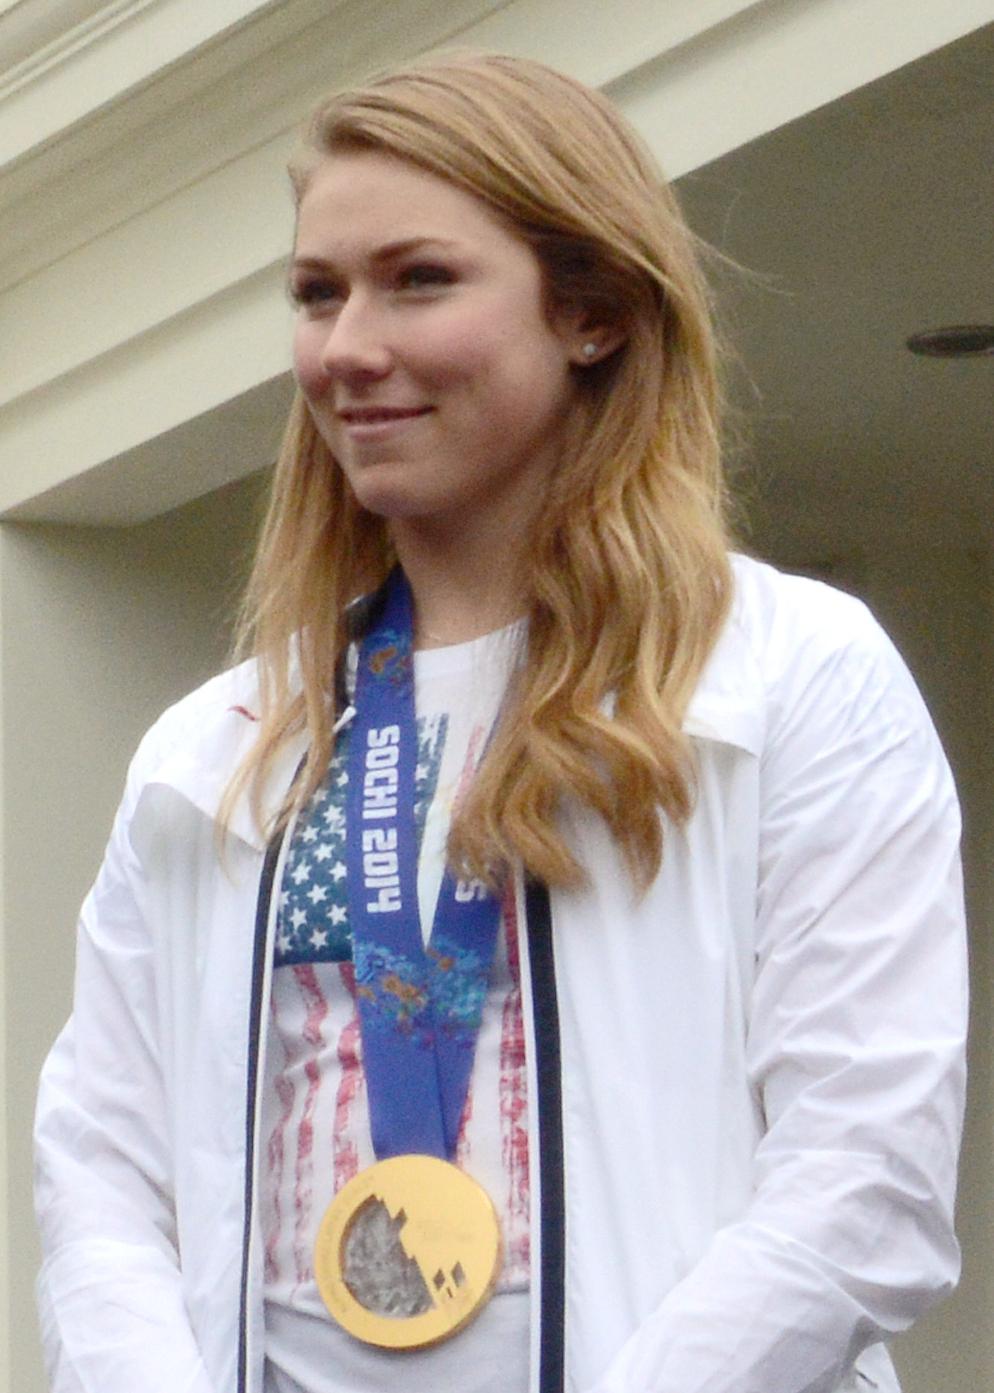 Michaela Shiffrin